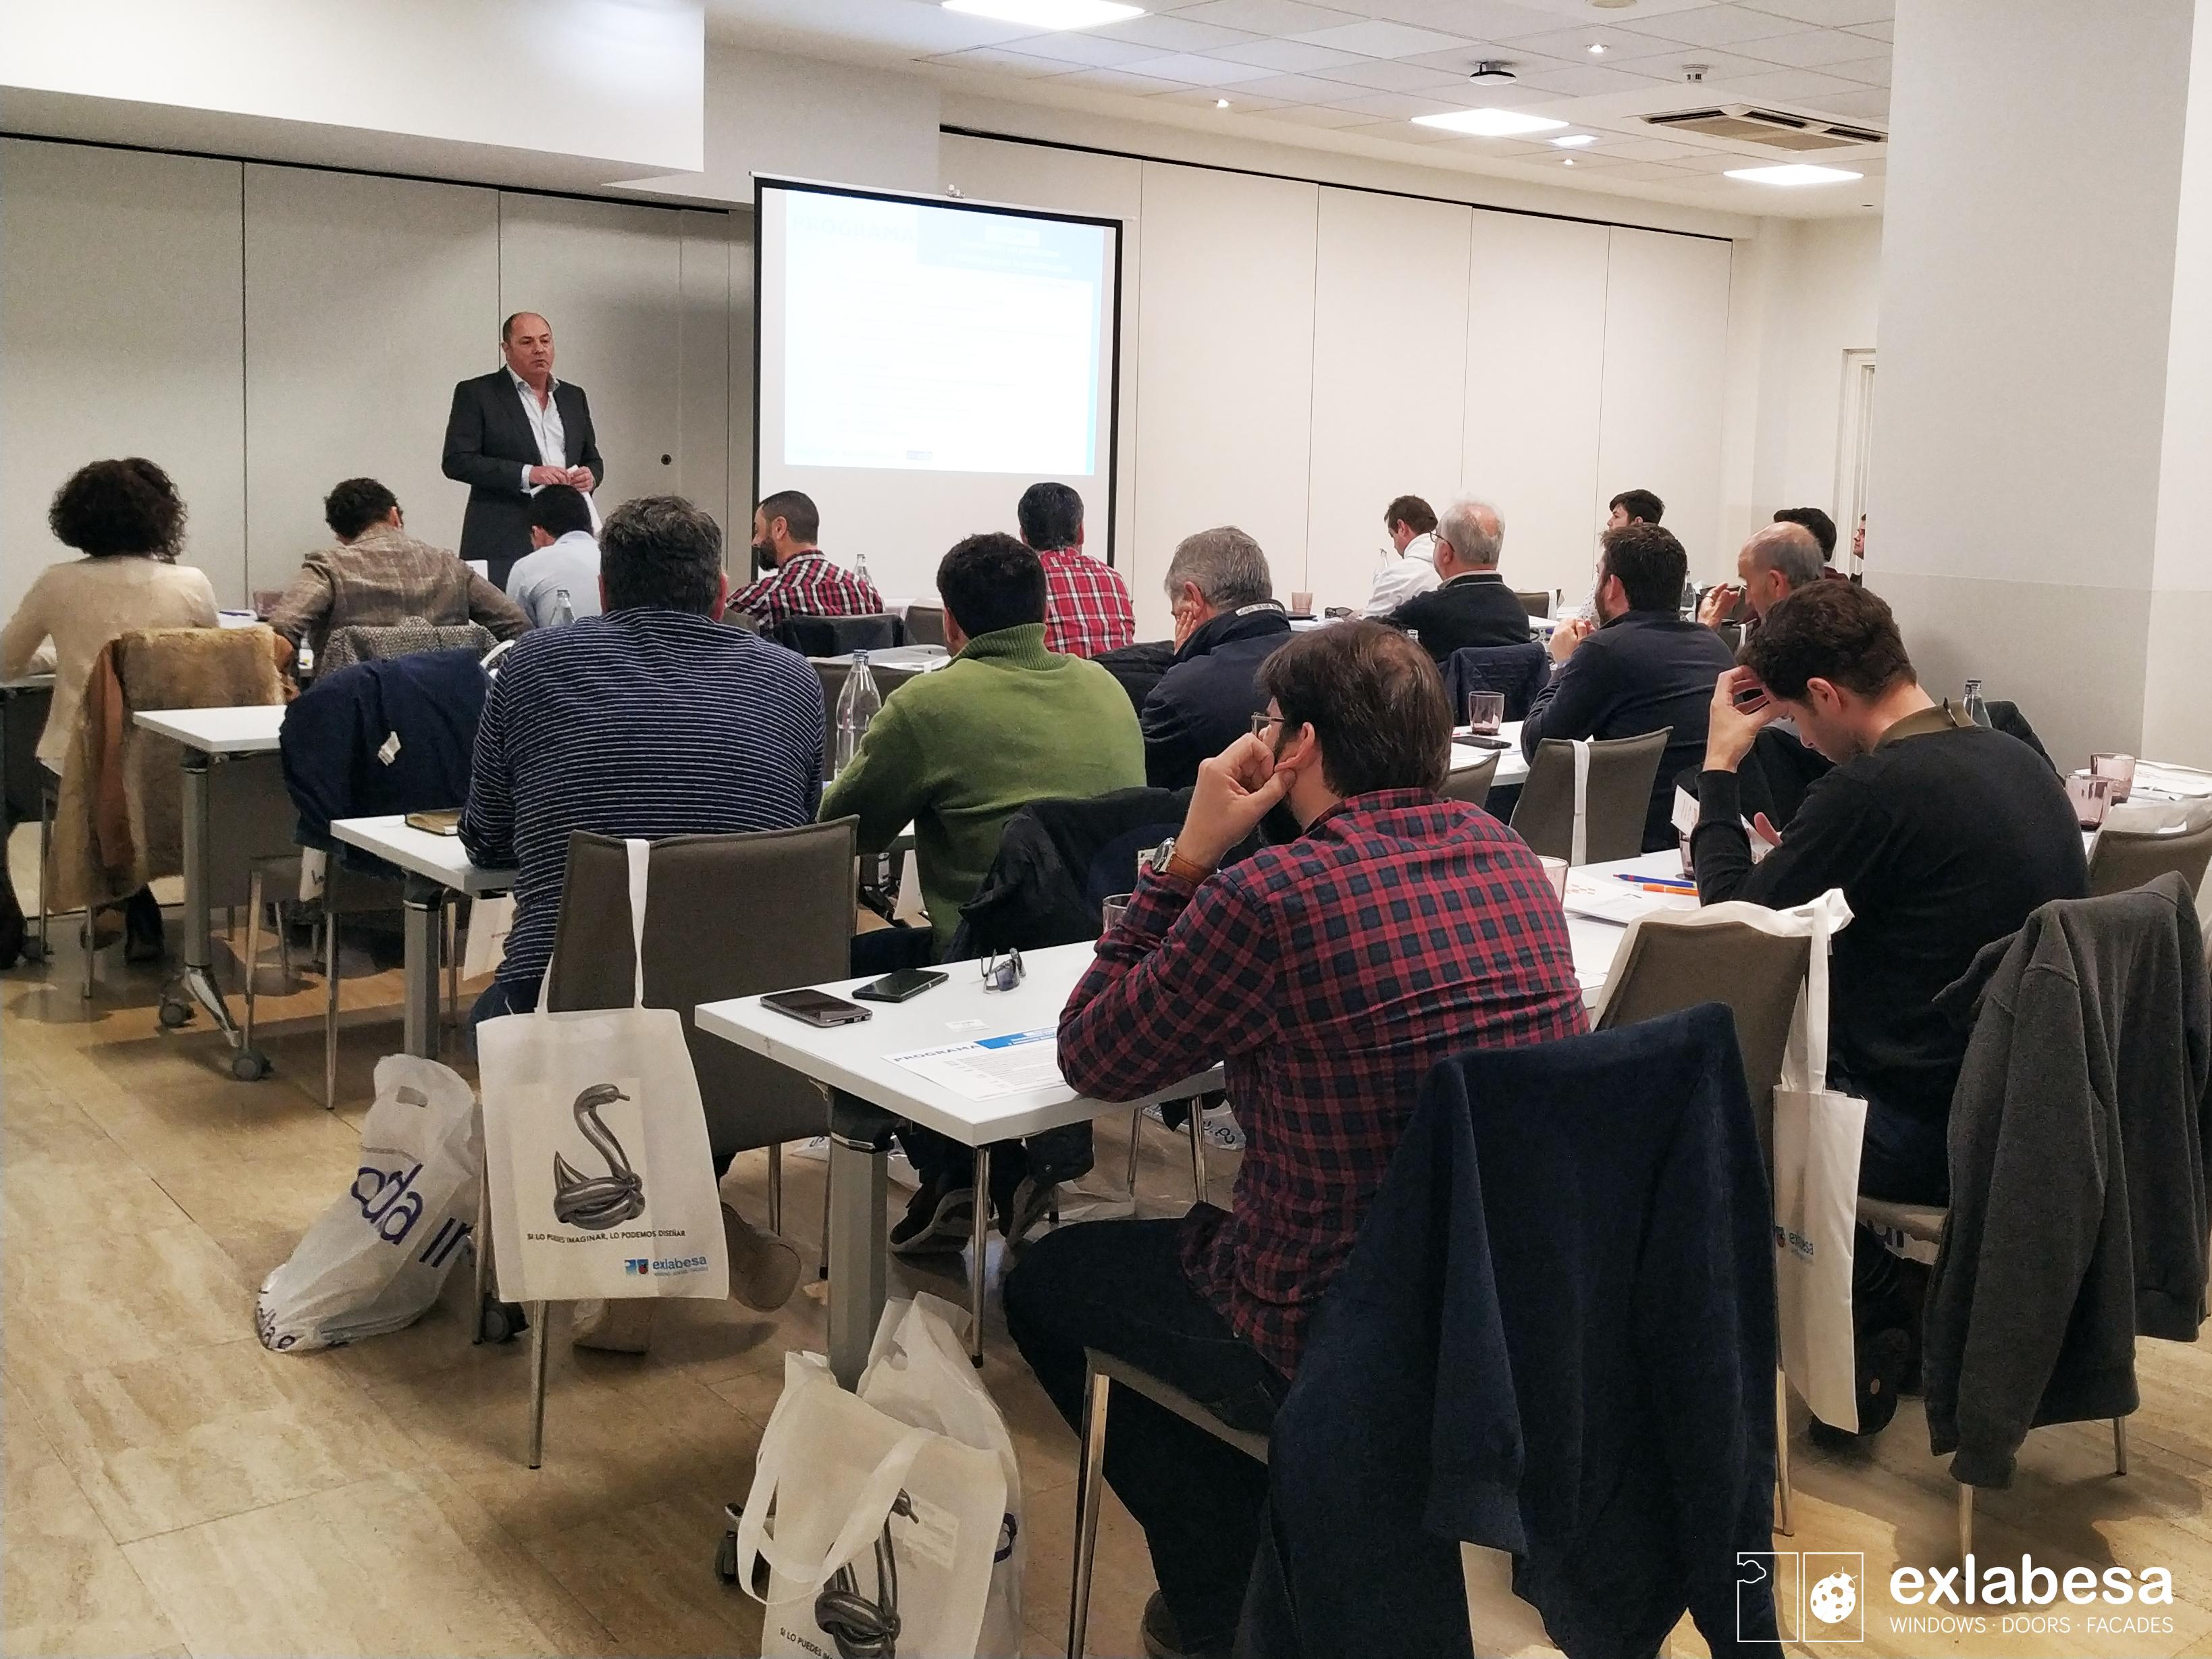 Aún quedan plazas para la jornada de rehabilitación de Donostia-San Sebastián